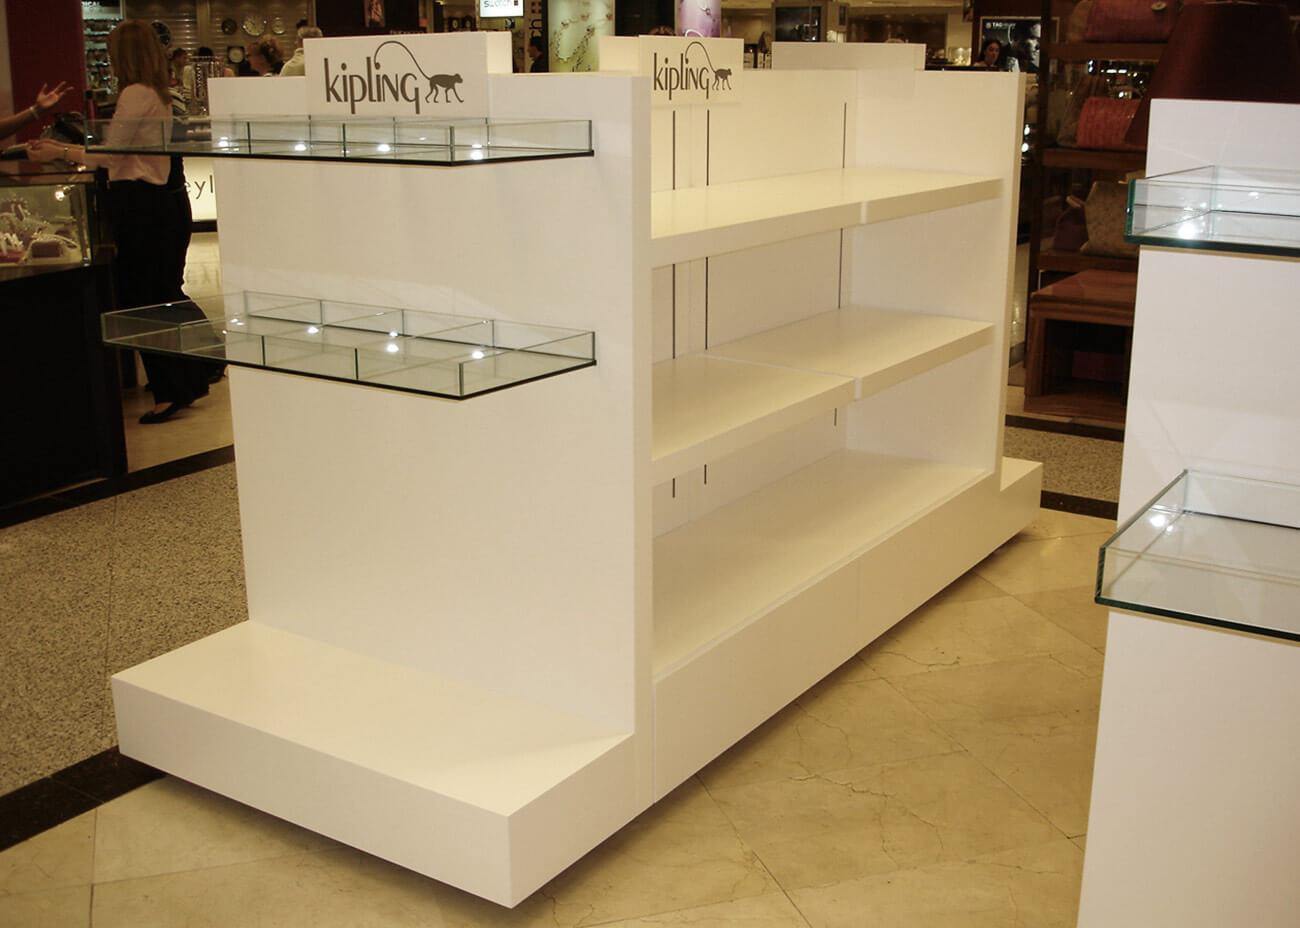 kipling-img08-caad-retail-design-barcelona-Recuperado